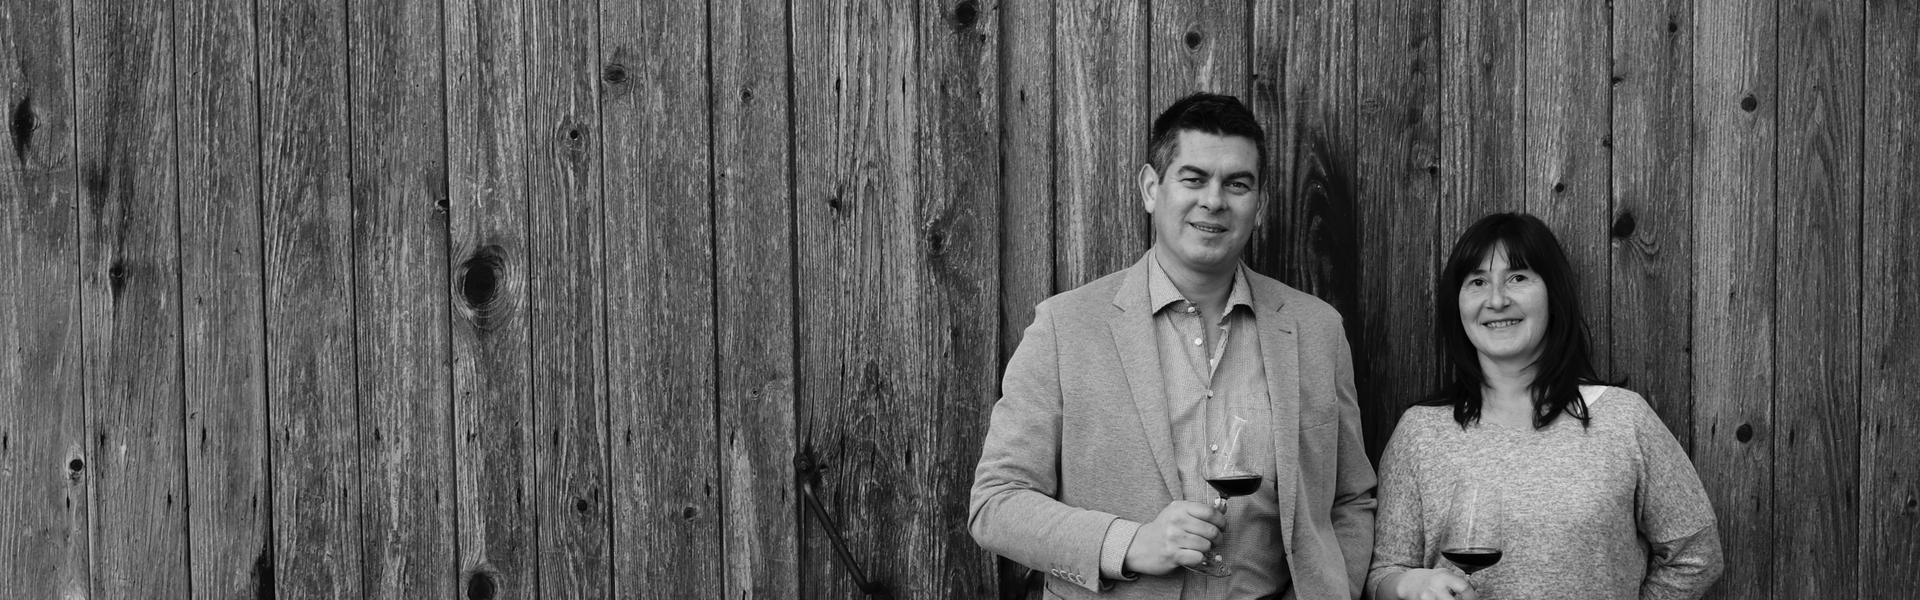 Weingut Leitner Gernot und Petra - Pannobile Gols Burgenland